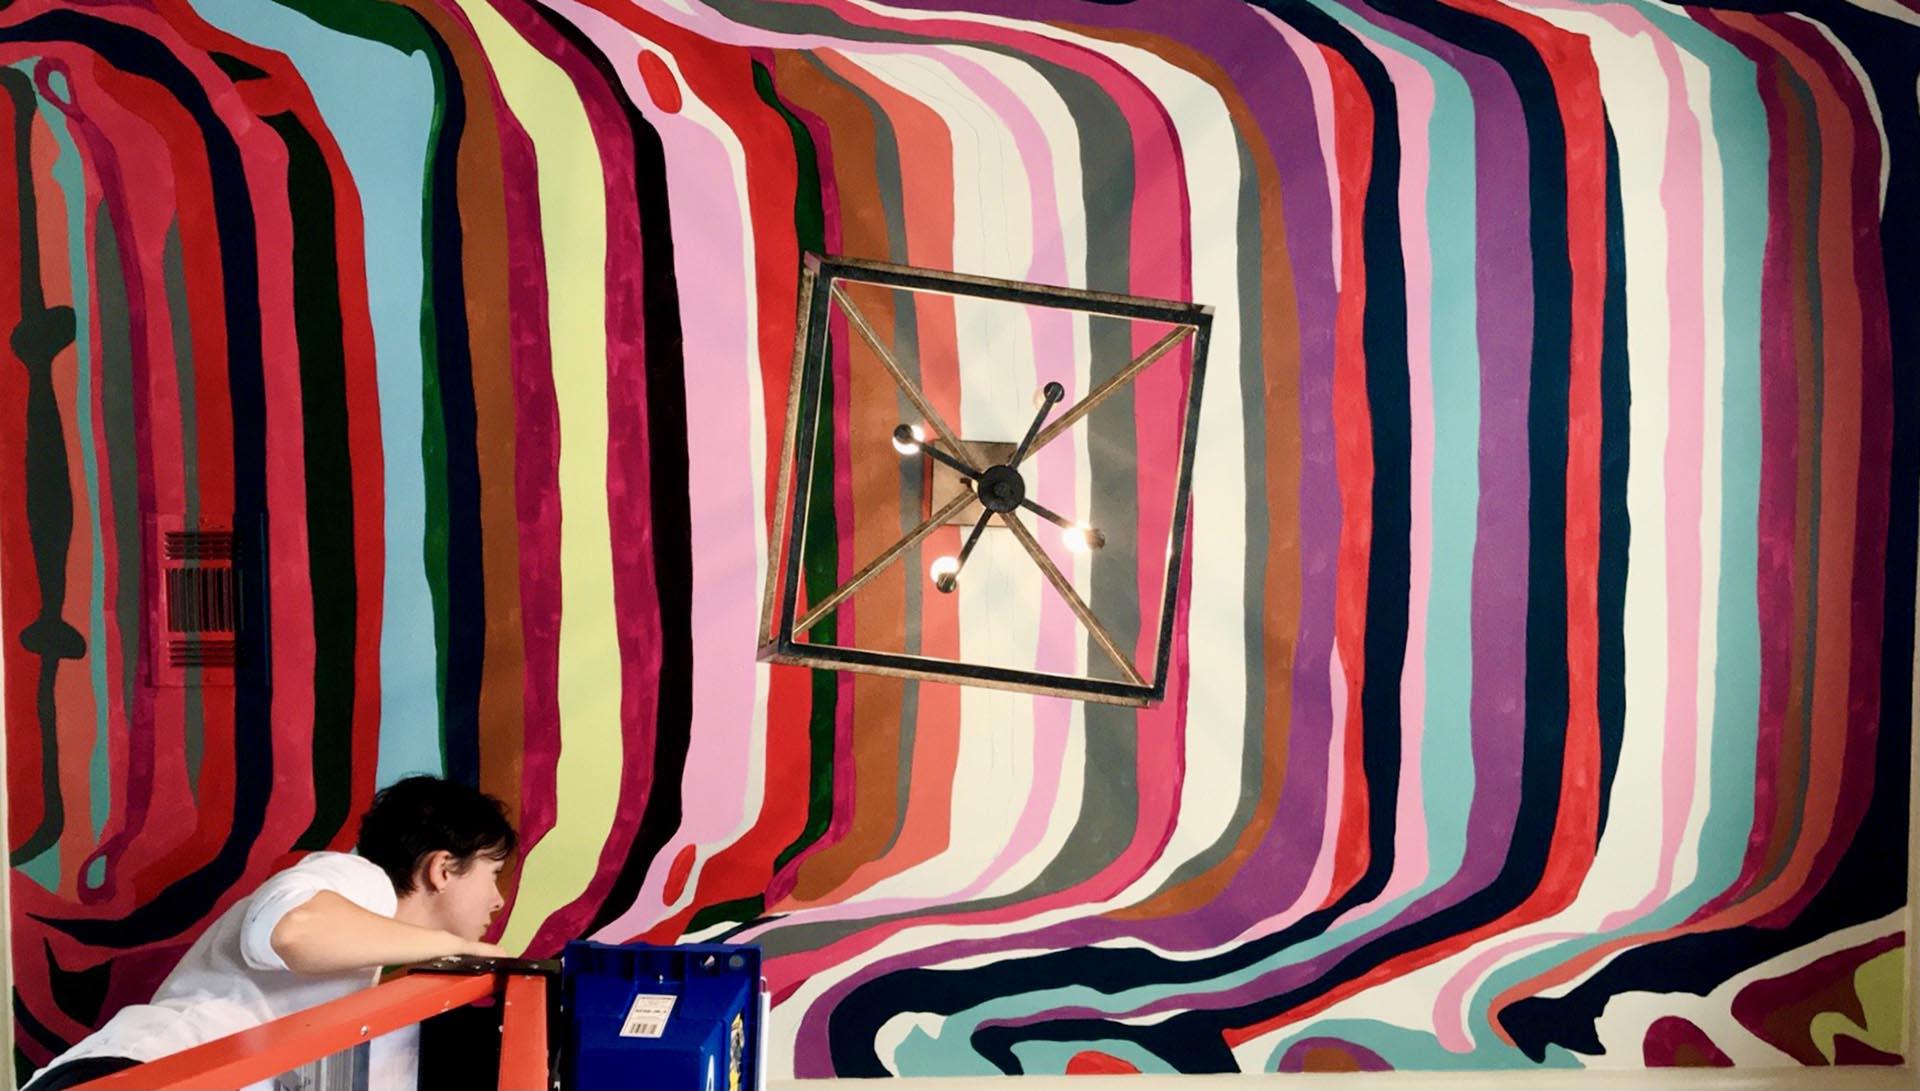 ceiling mural - abstract mural - custom mural - mural - Dace Kidd - Mural Artist Tx